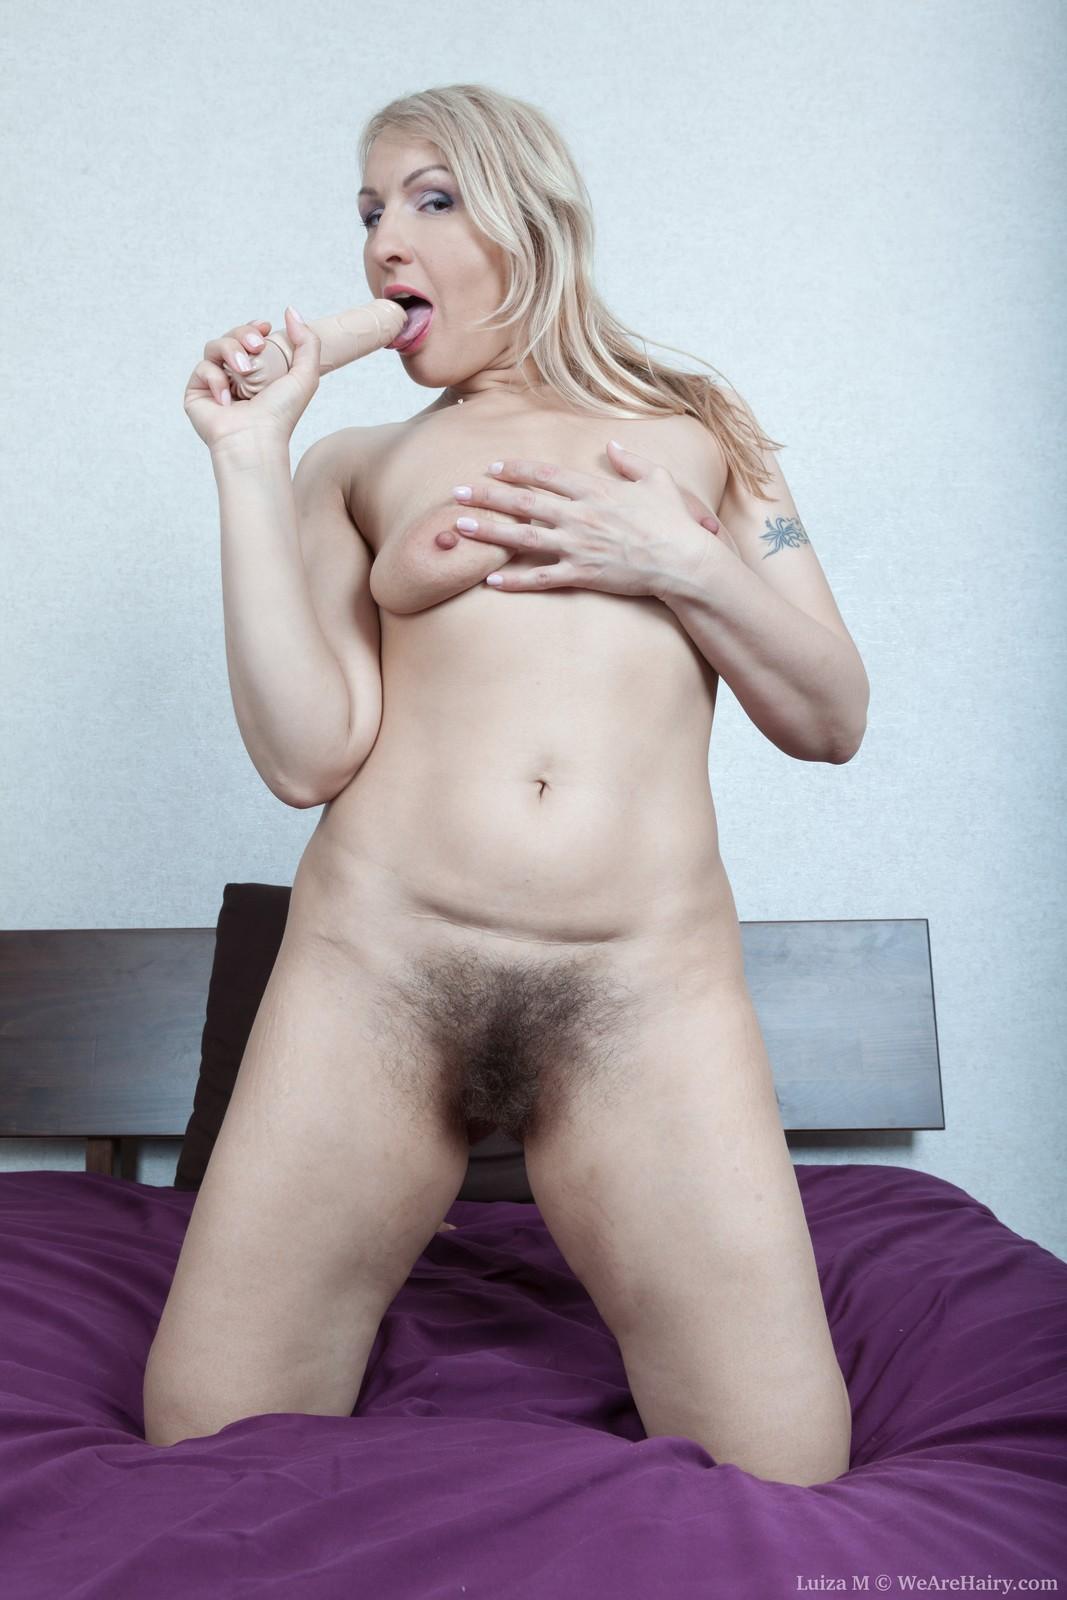 wpid-luiza-m-masturbates-with-her-vibrator16.jpg